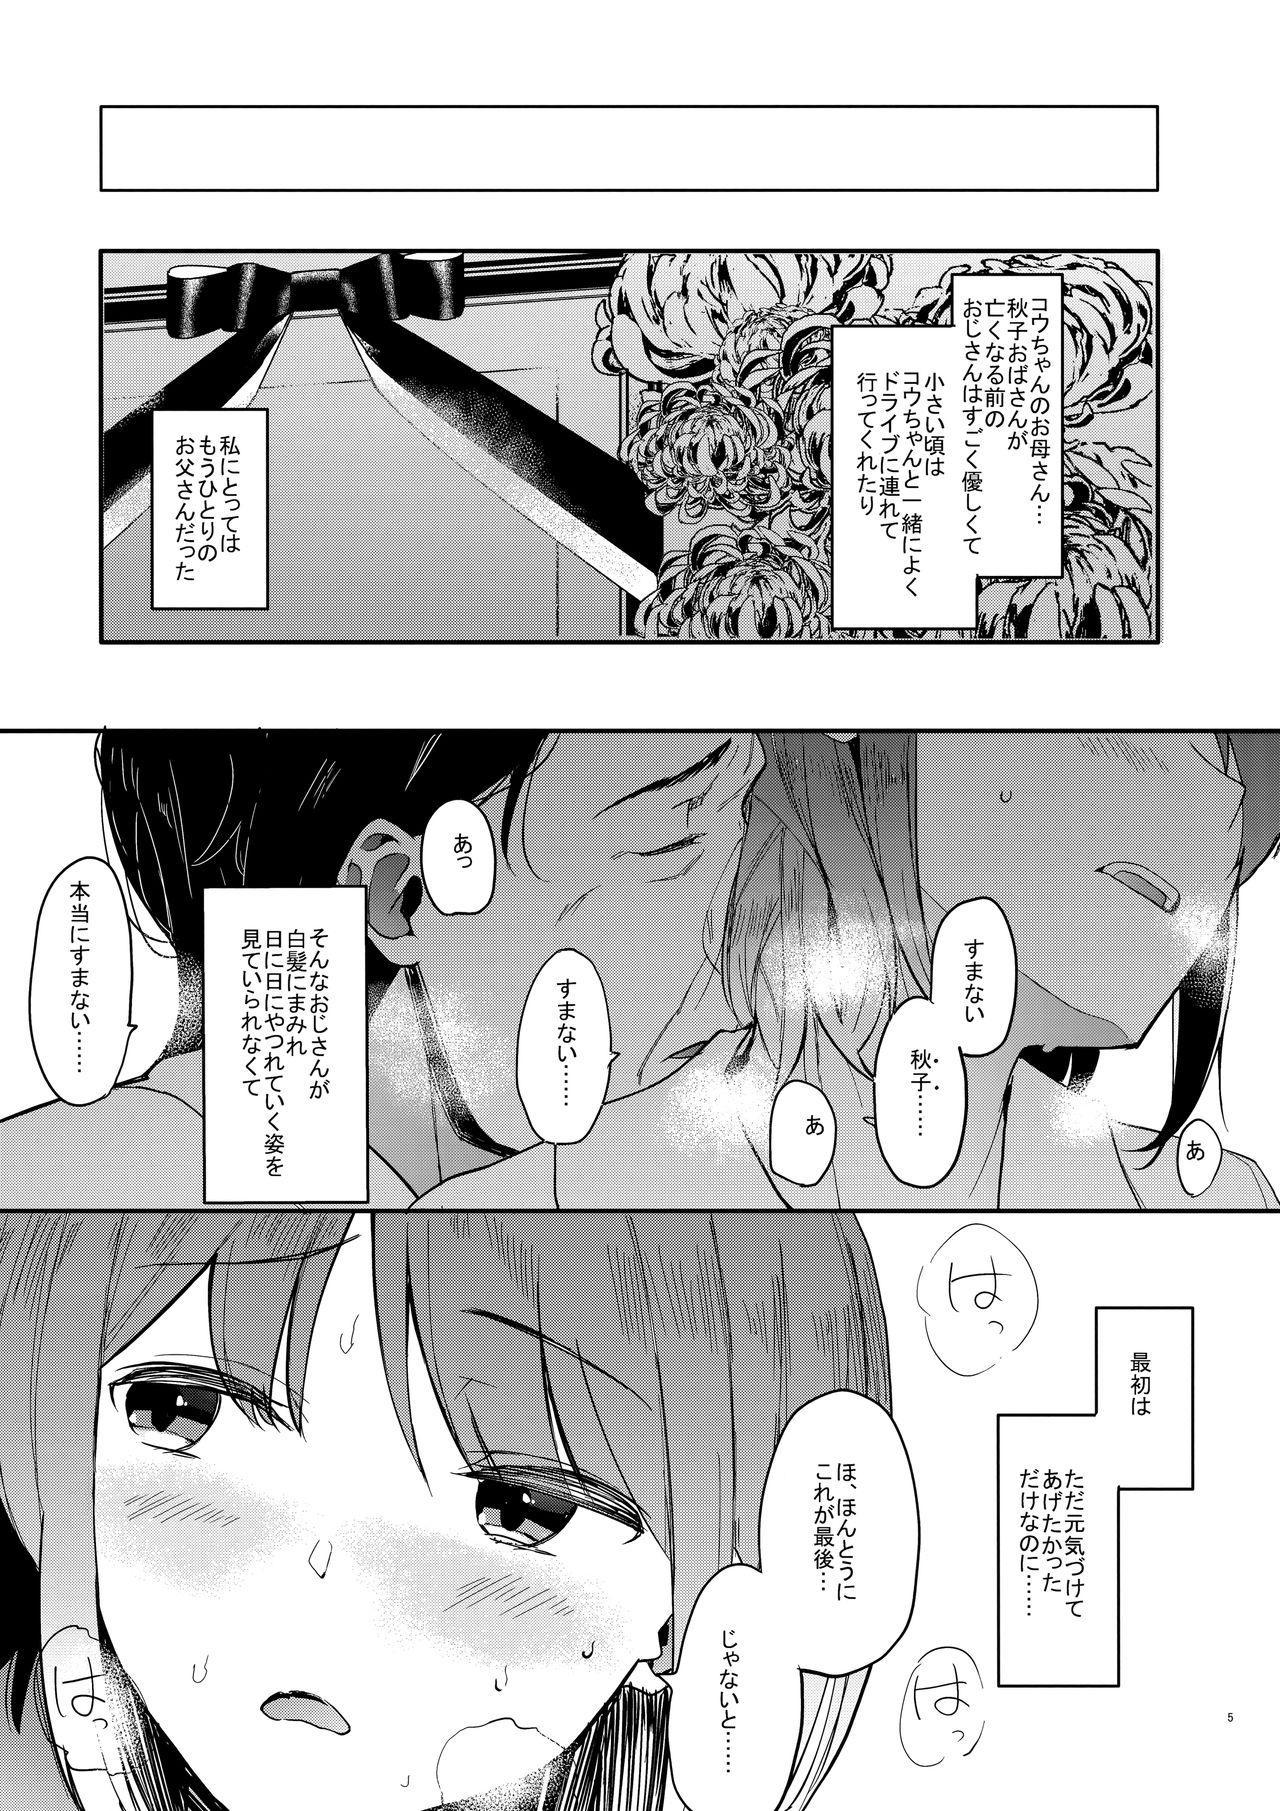 Yuzu-nee 5